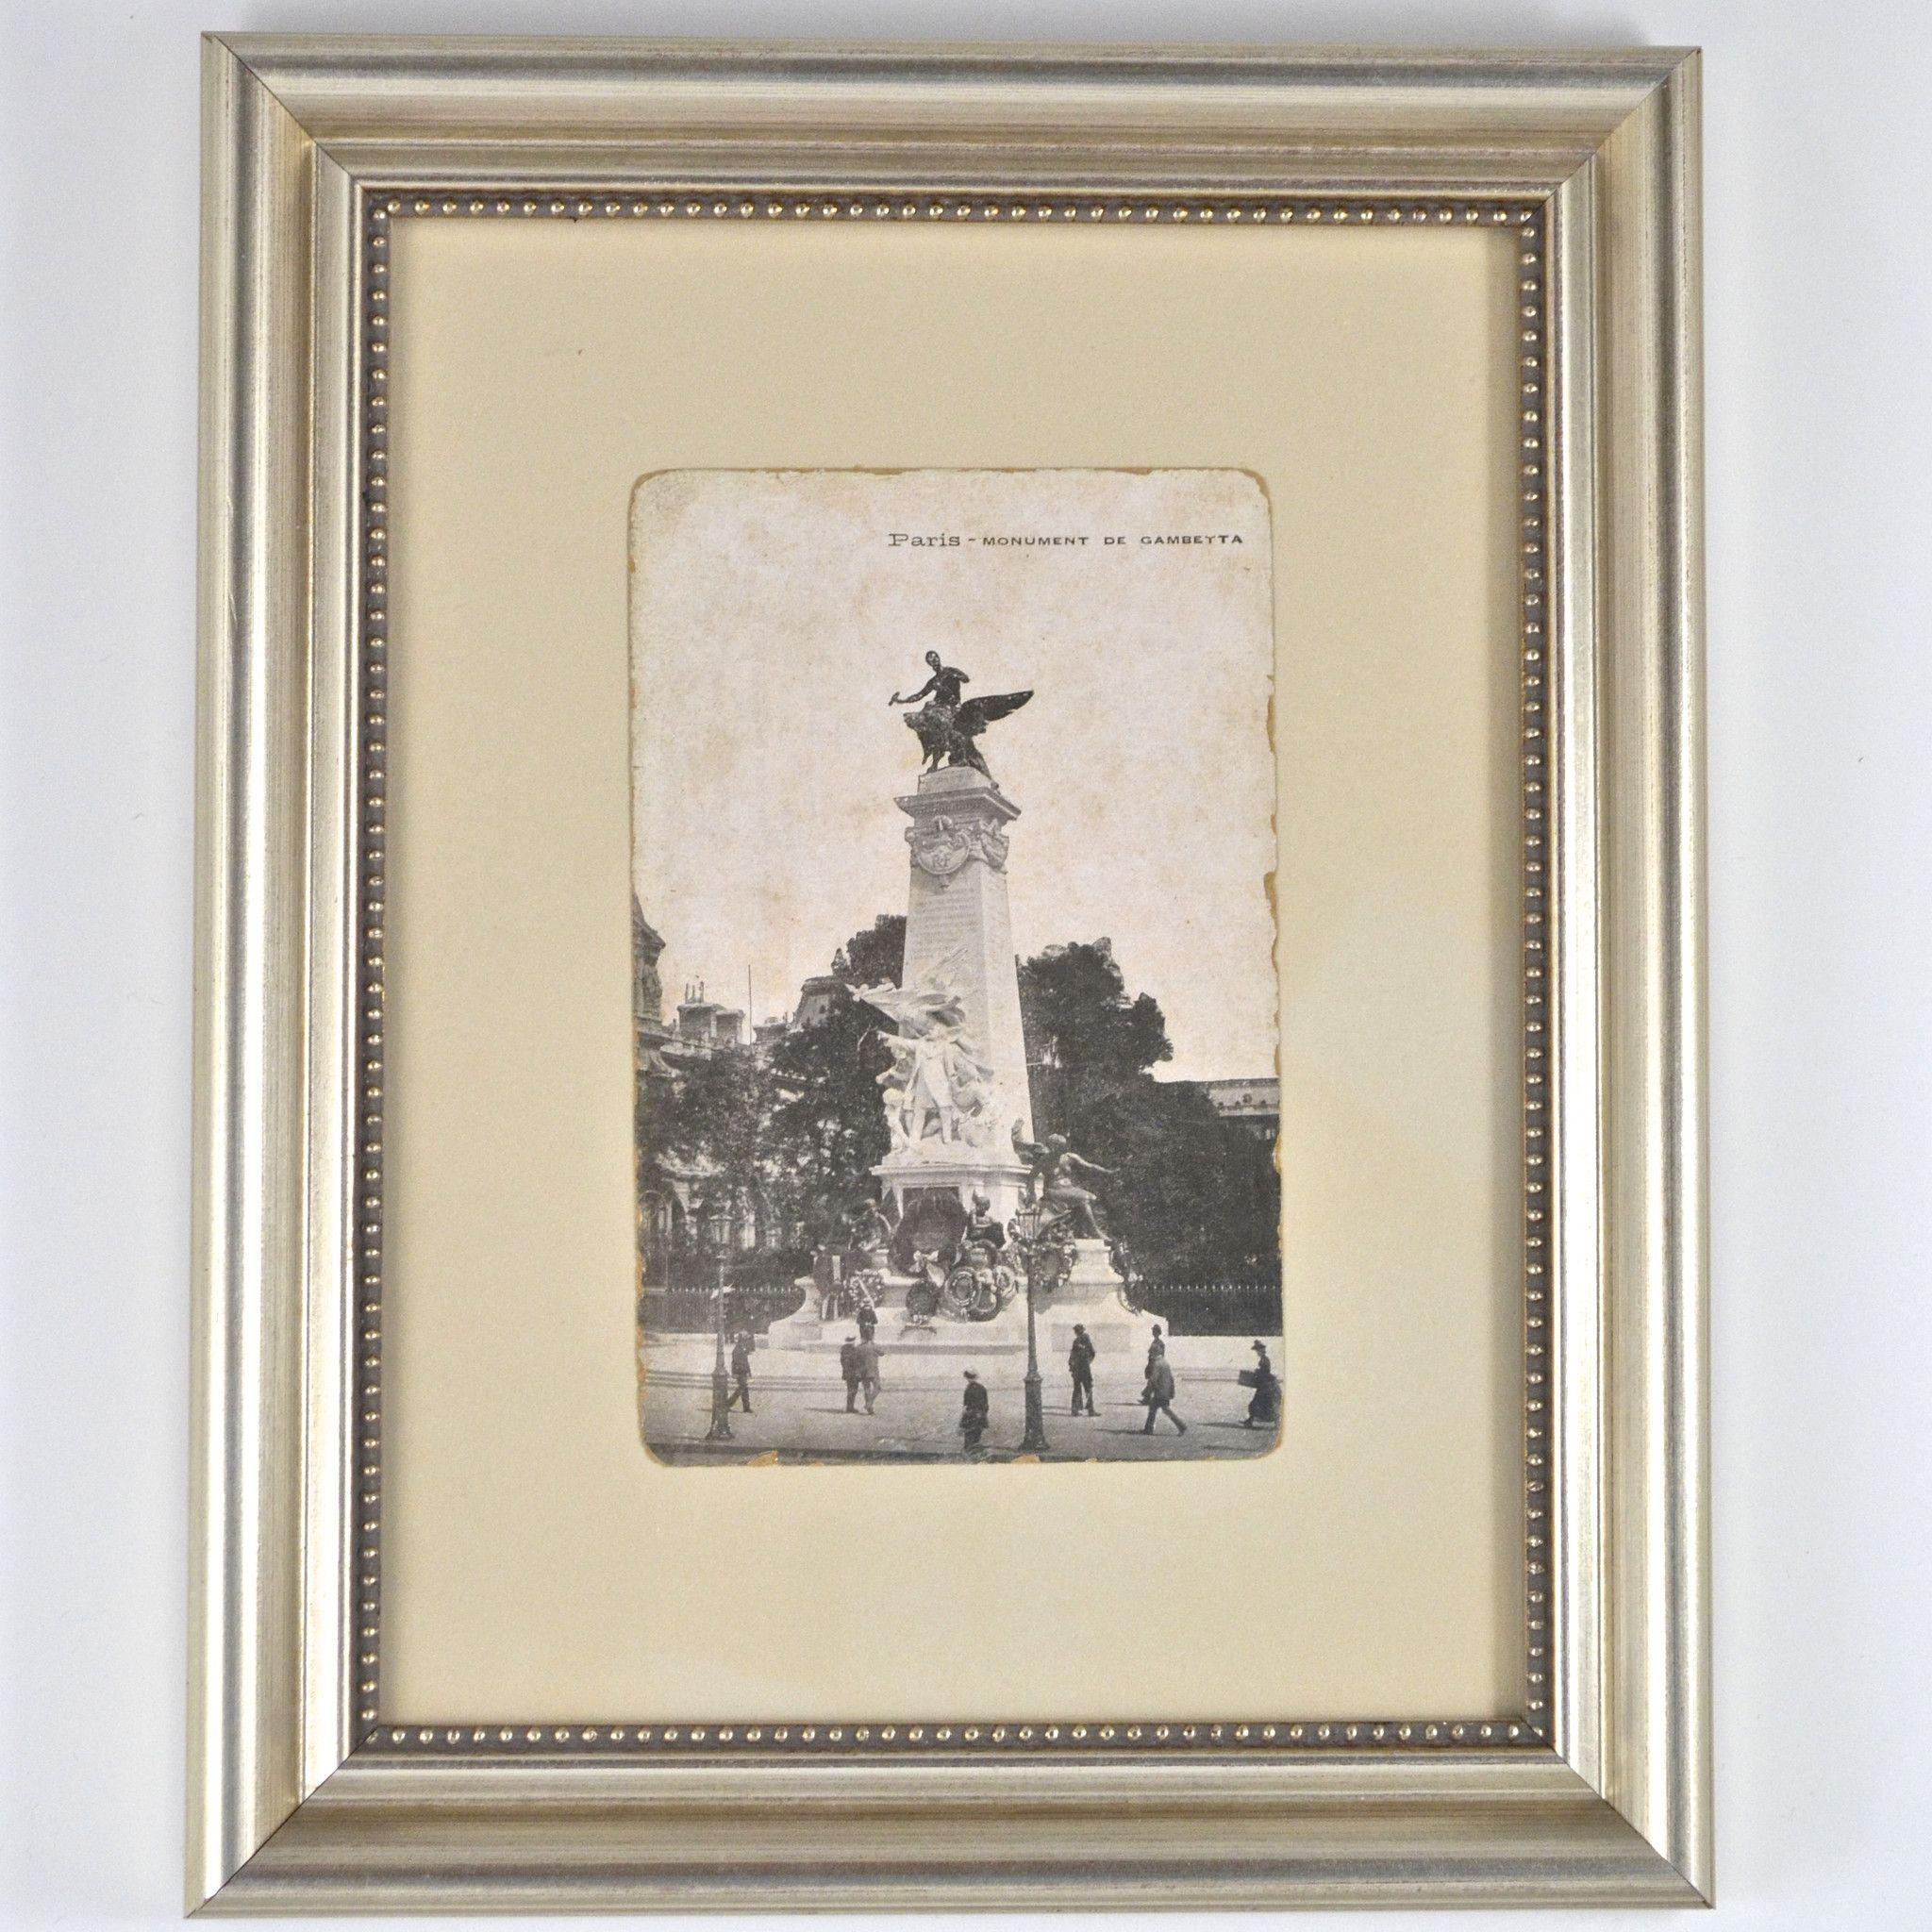 Custom Framed Vintage Postcard - Monument de Gambetta in Paris ...